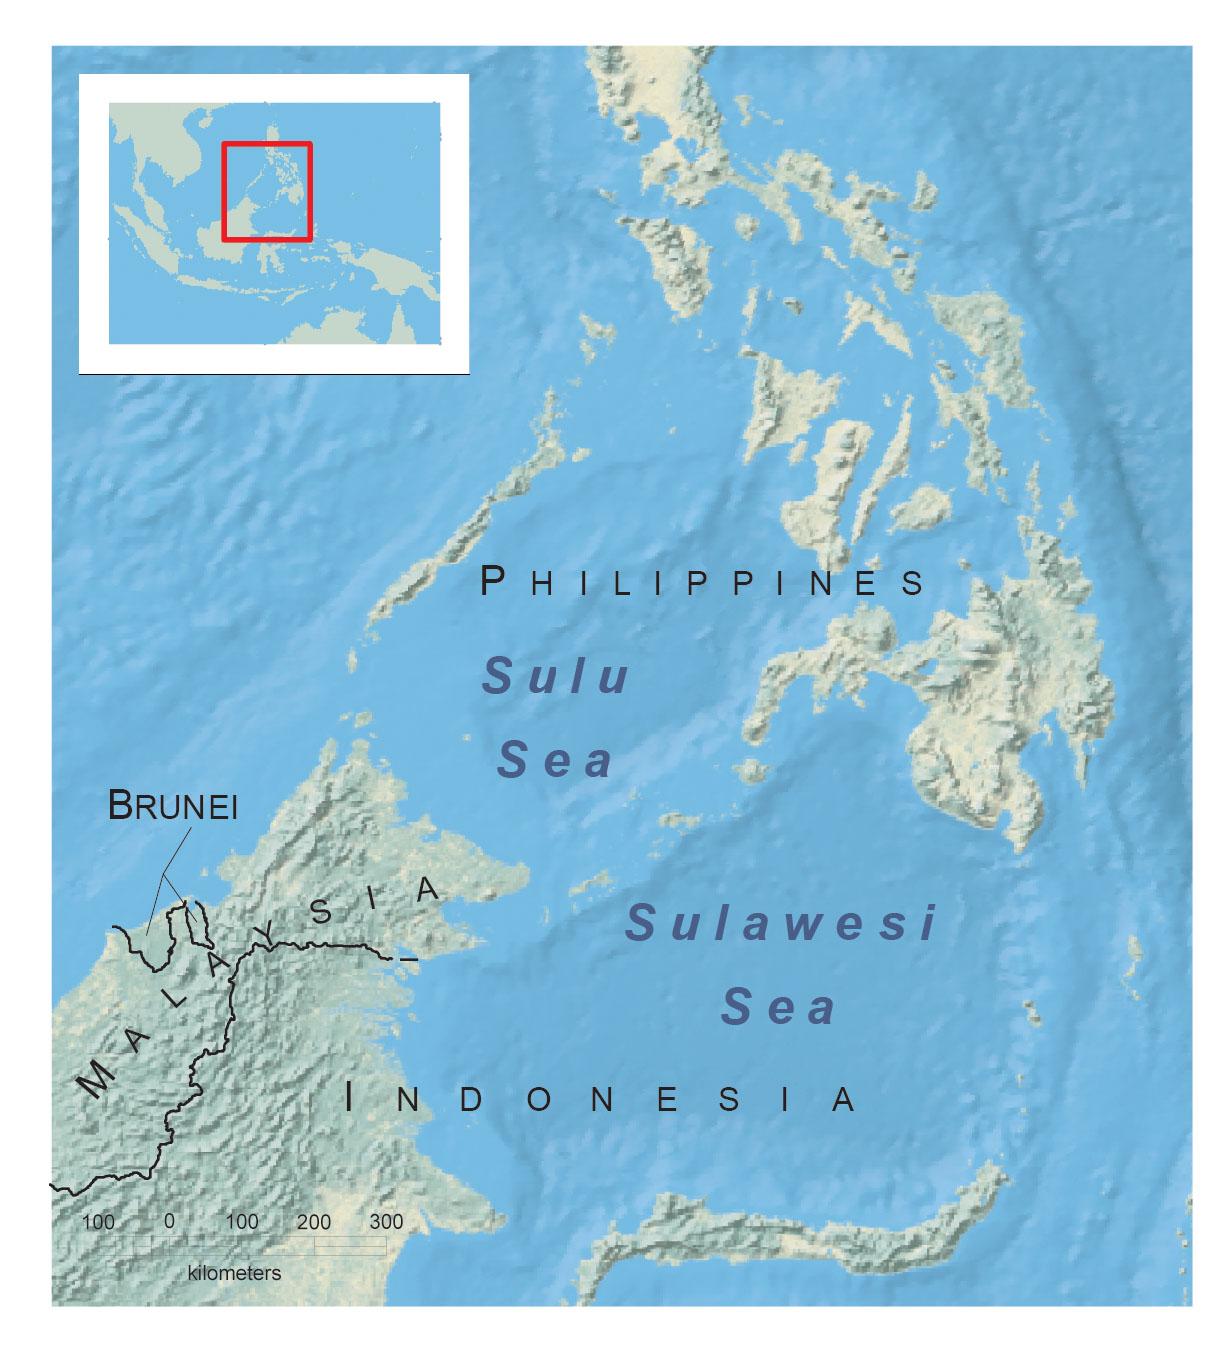 The Sulu-Sulawesi Seascape. © CONSERVATION INTERNATIONAL